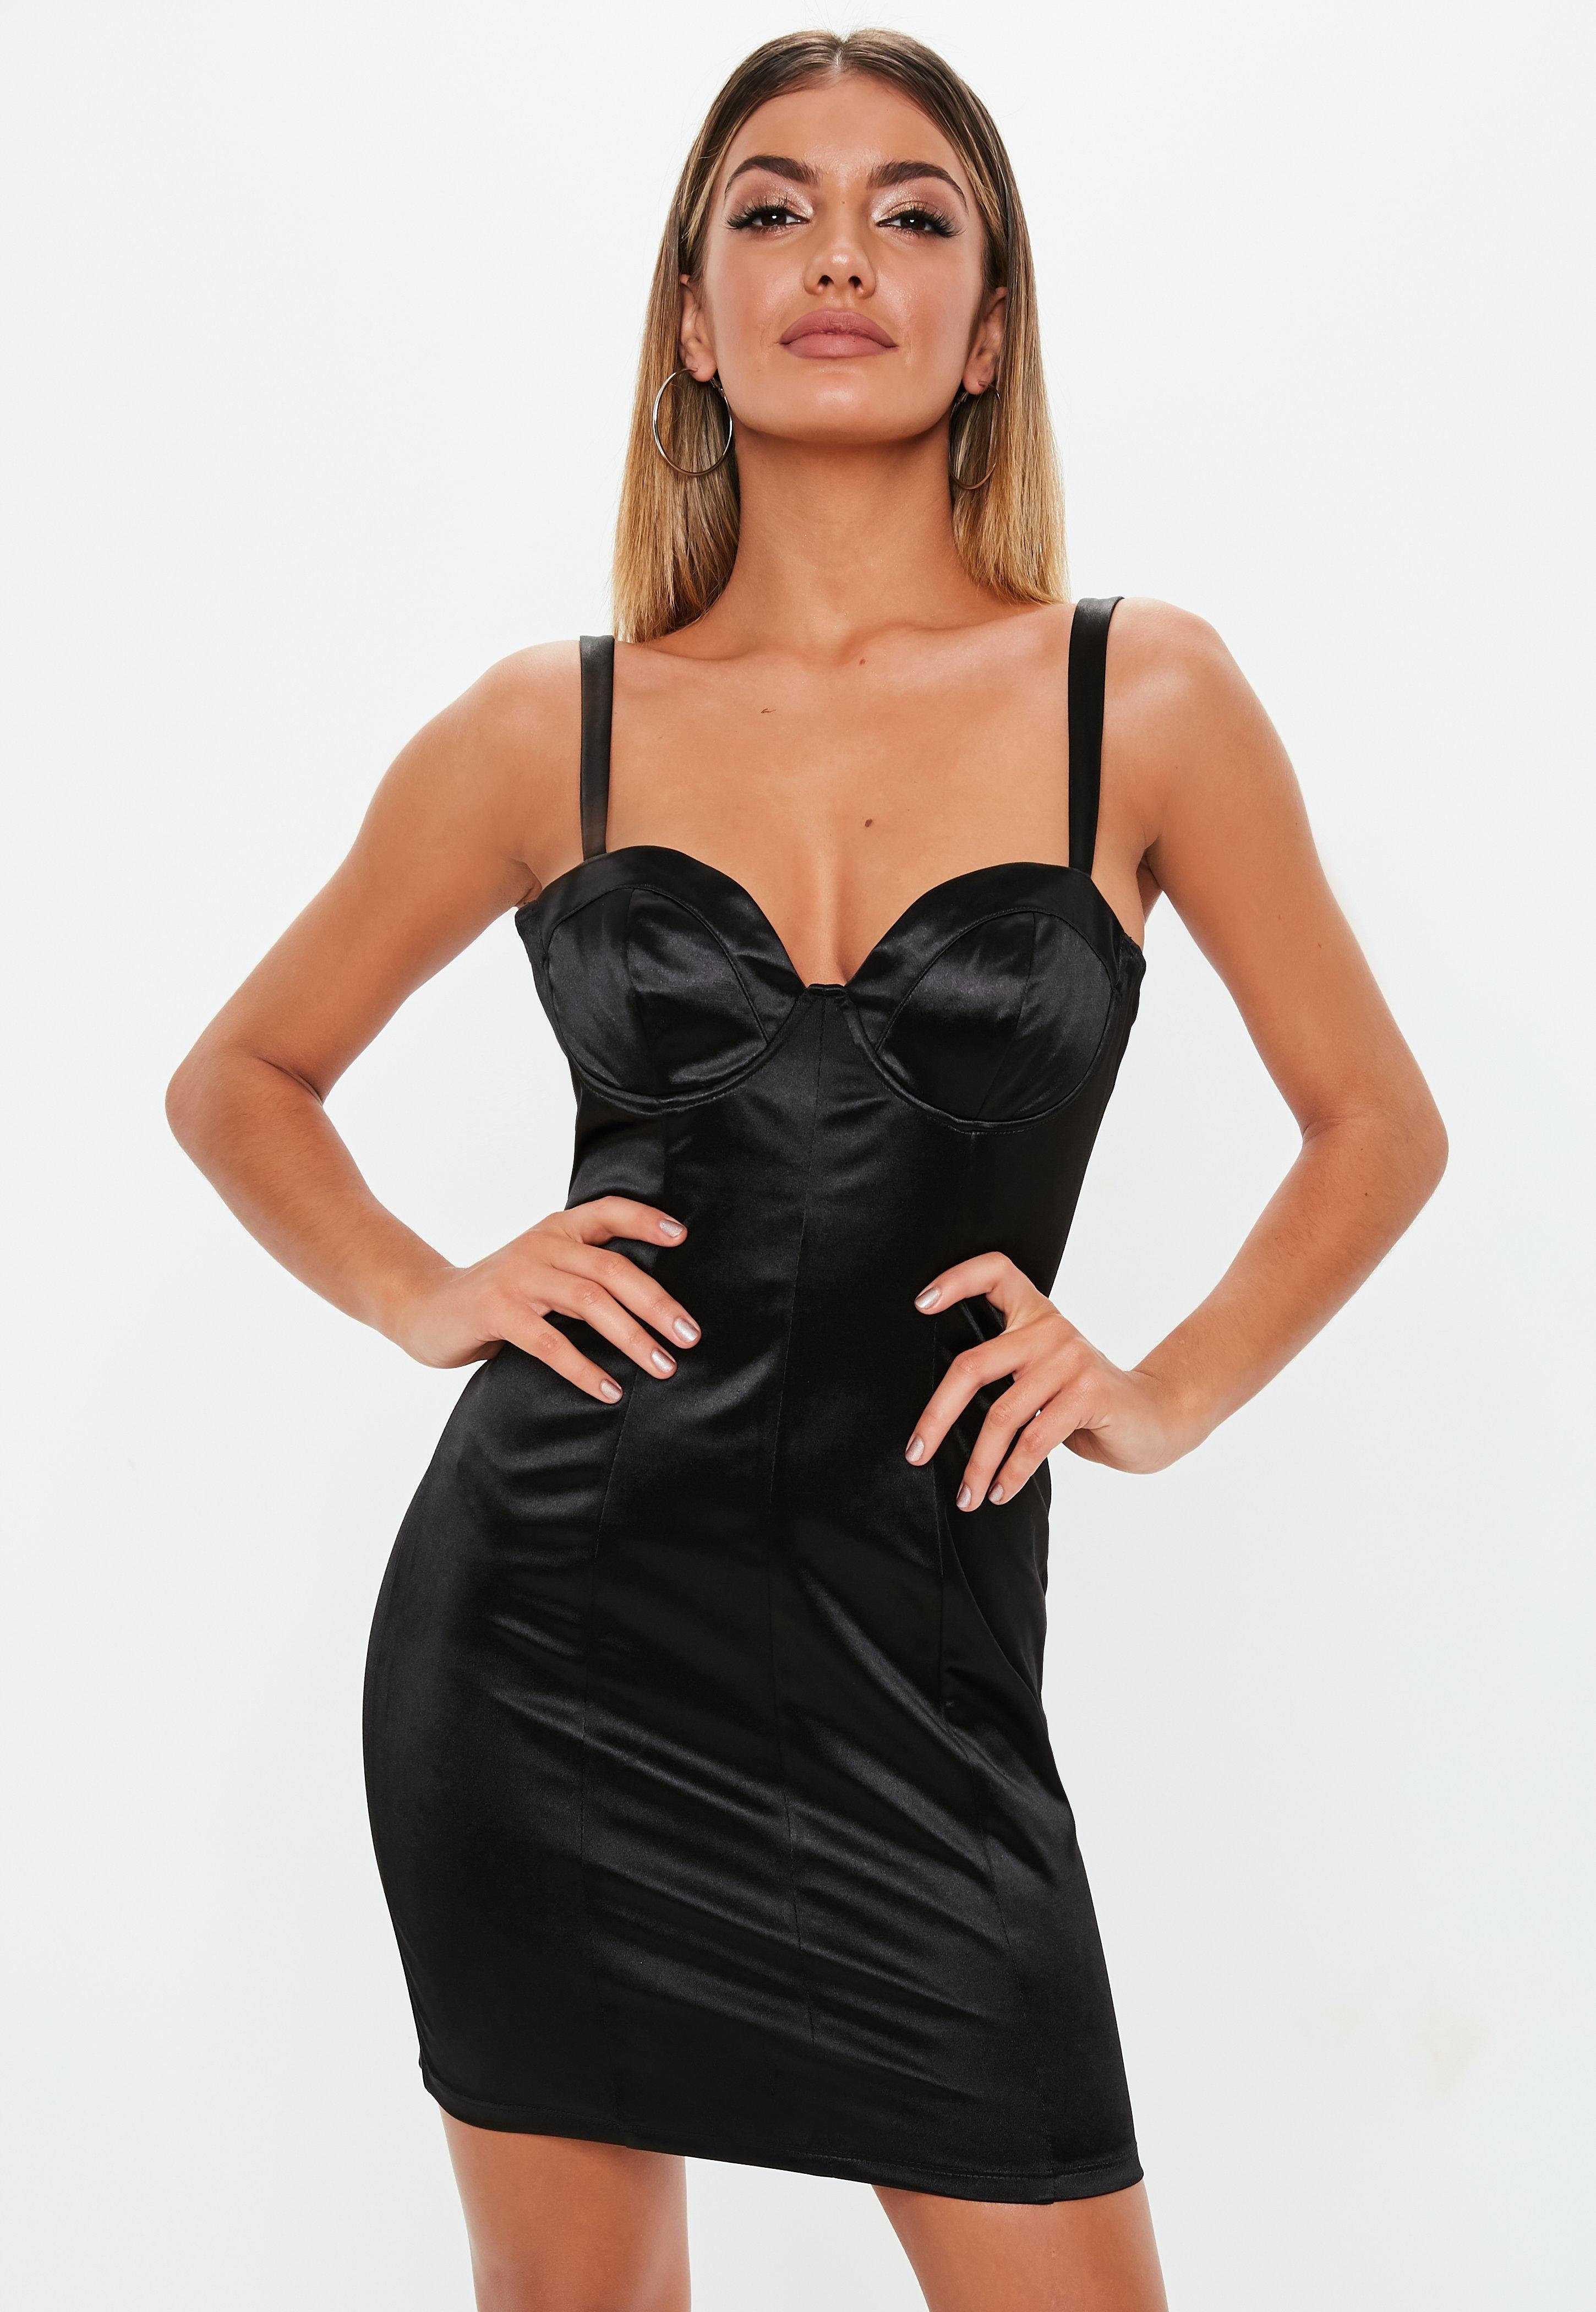 06b0cf05172 Cheap Clothes Online - Women s Sale Clothing